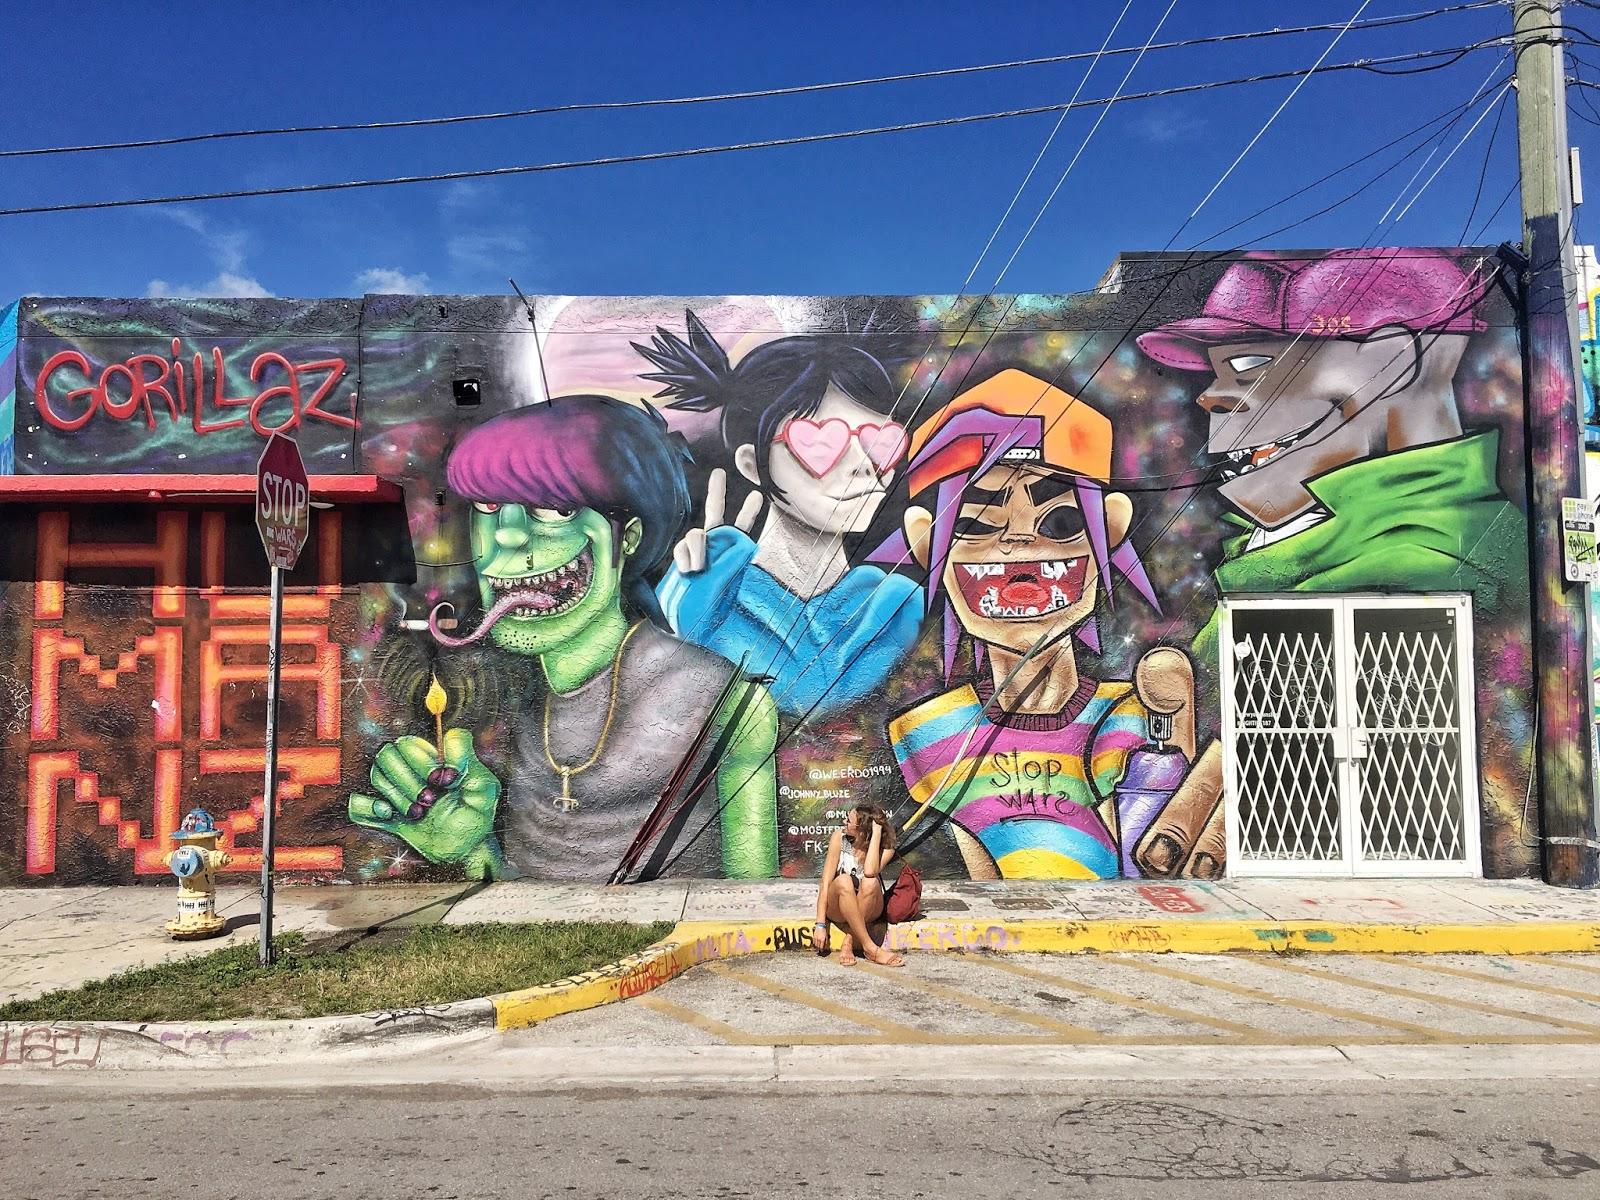 Miami, USA, Gorillaz mural